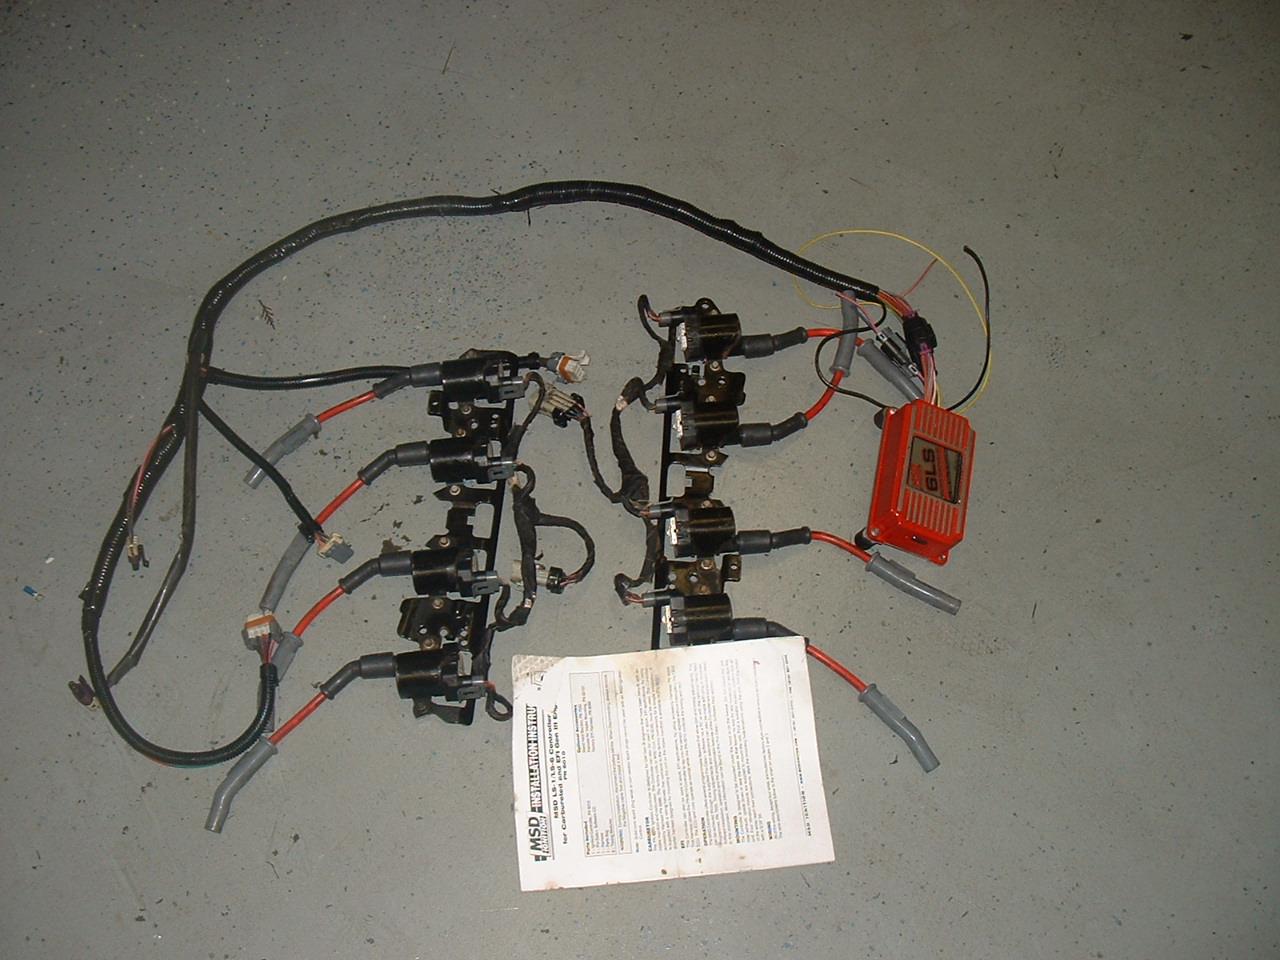 hight resolution of msd 6ls wiring harness wiring diagrams konsult msd 8860 wiring harness msd 6ls wiring harness blog